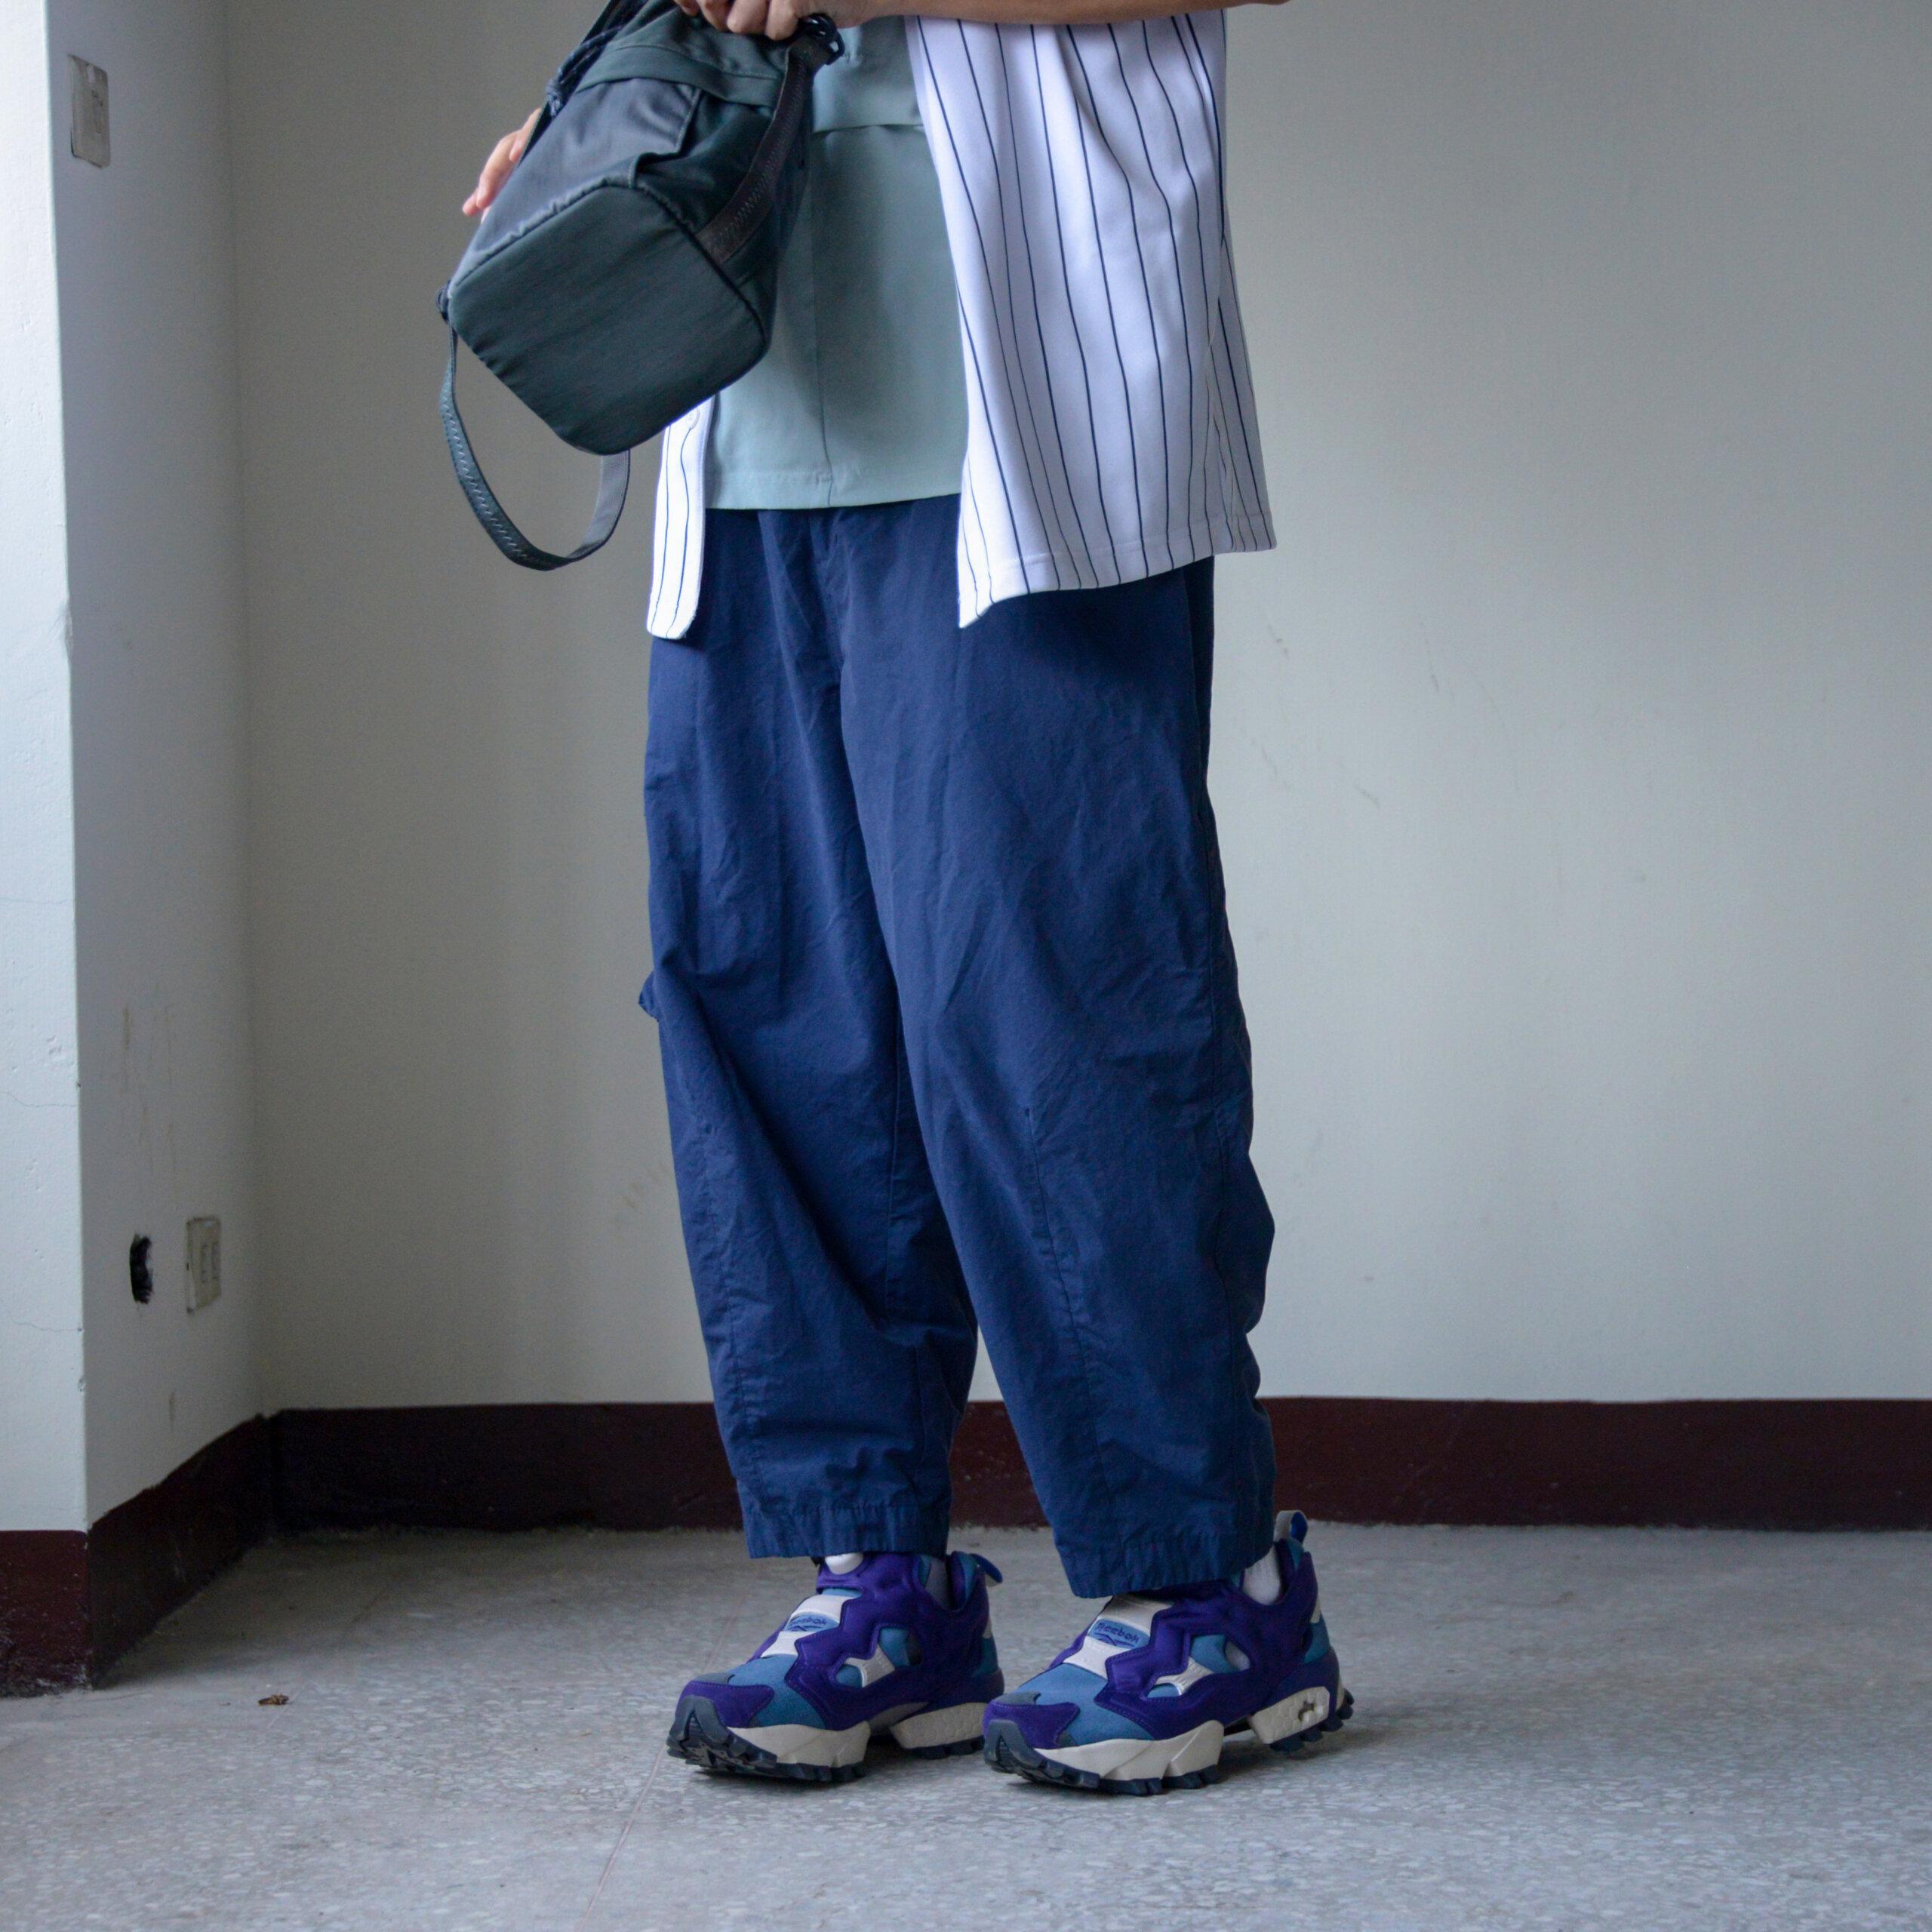 mouggan plain-me,1616 LOKA,1616百搭神褲,akko,gravis,gravis plain-me,gravis 聯名,PM 旅行小包,pm小包穿搭,一週搭配,休閒搭配,小包搭配,小包穿搭,搭配型人,男生穿搭,皮鞋,街頭,街頭型人,街頭搭配